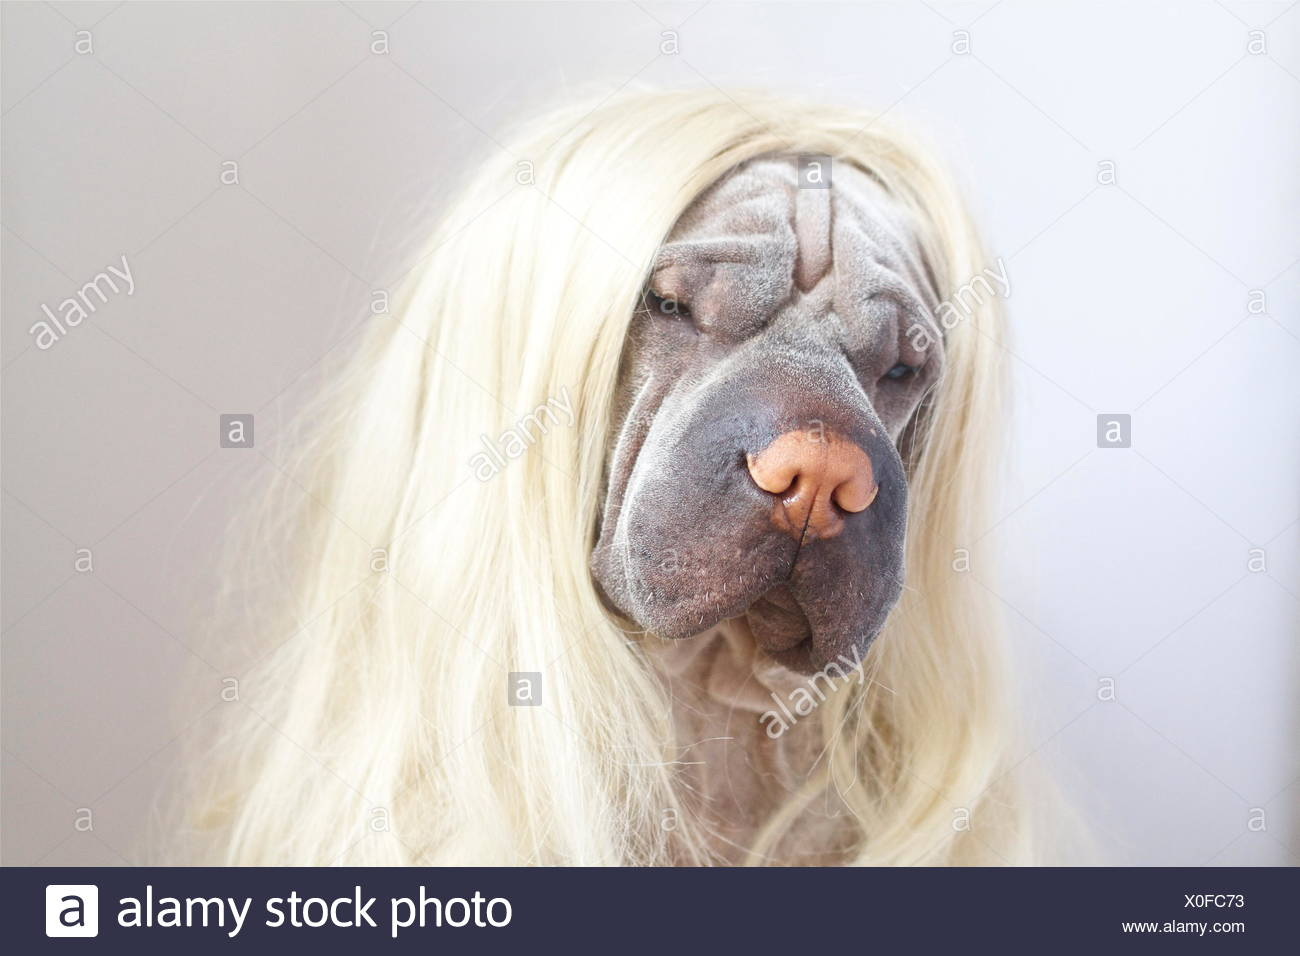 Portrait of a Shar pei dog wearing long blonde wig - Stock Image